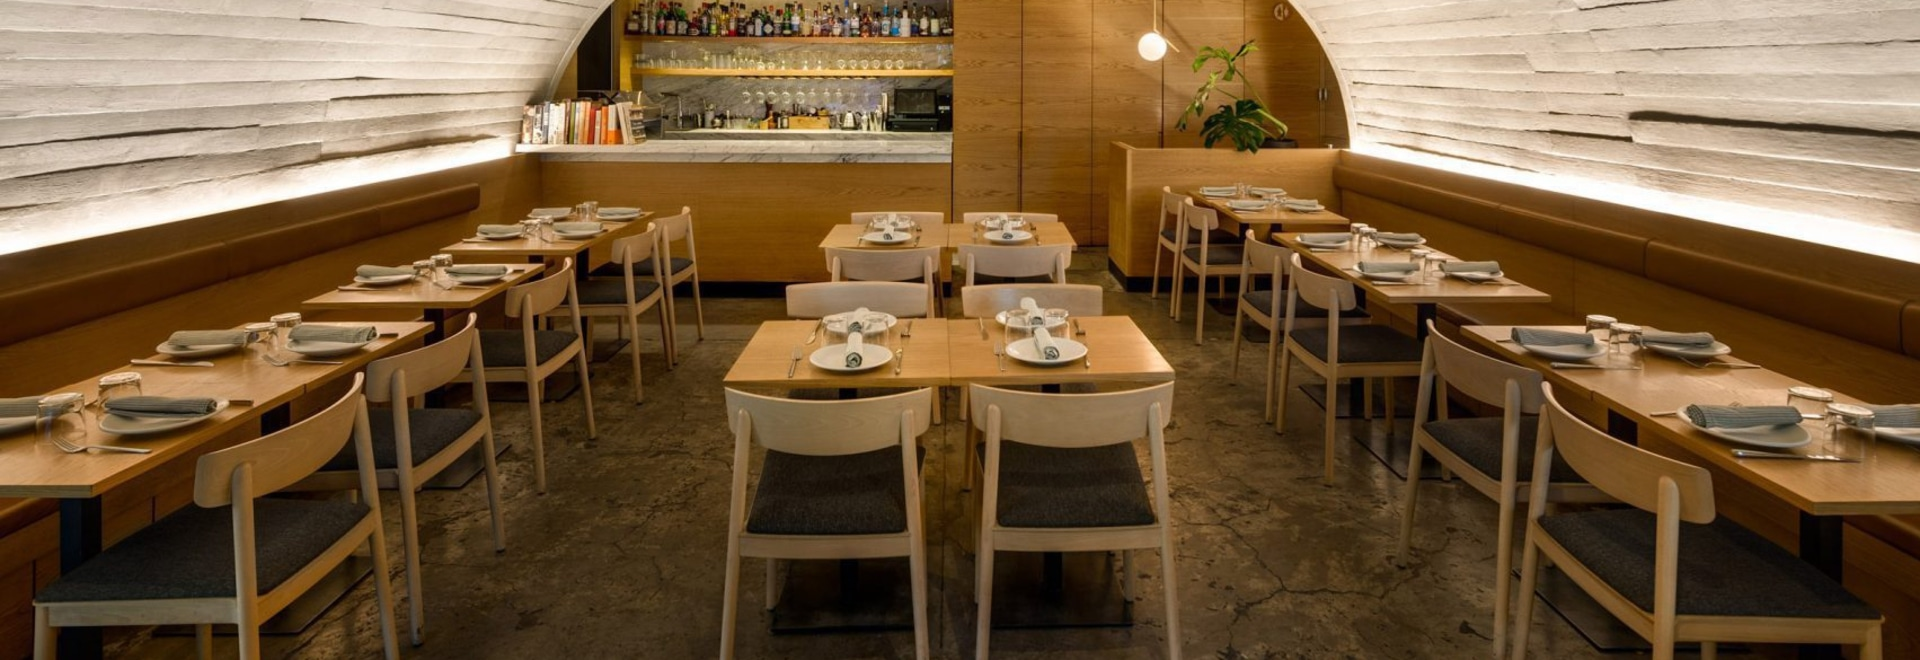 Betonbogen bedeckt Mexiko City's italienisches Restaurant Sartoria